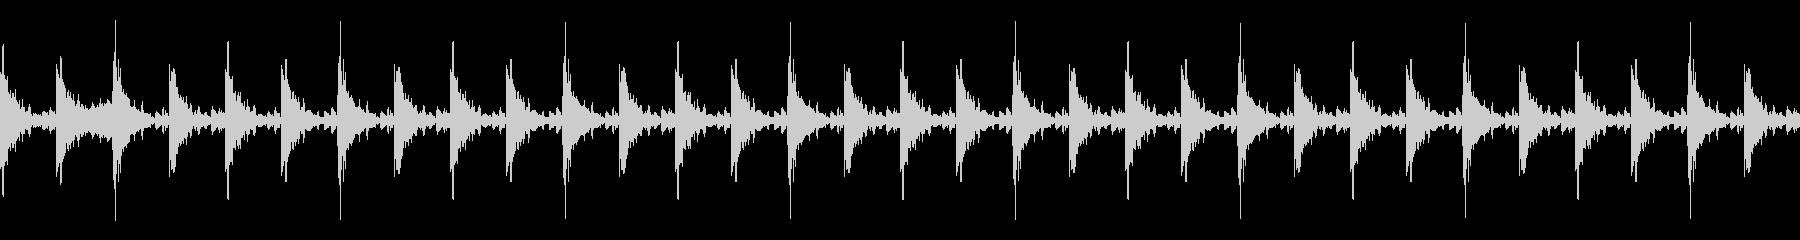 太鼓 躍動的 迫力 効果音ループ素材#1の未再生の波形